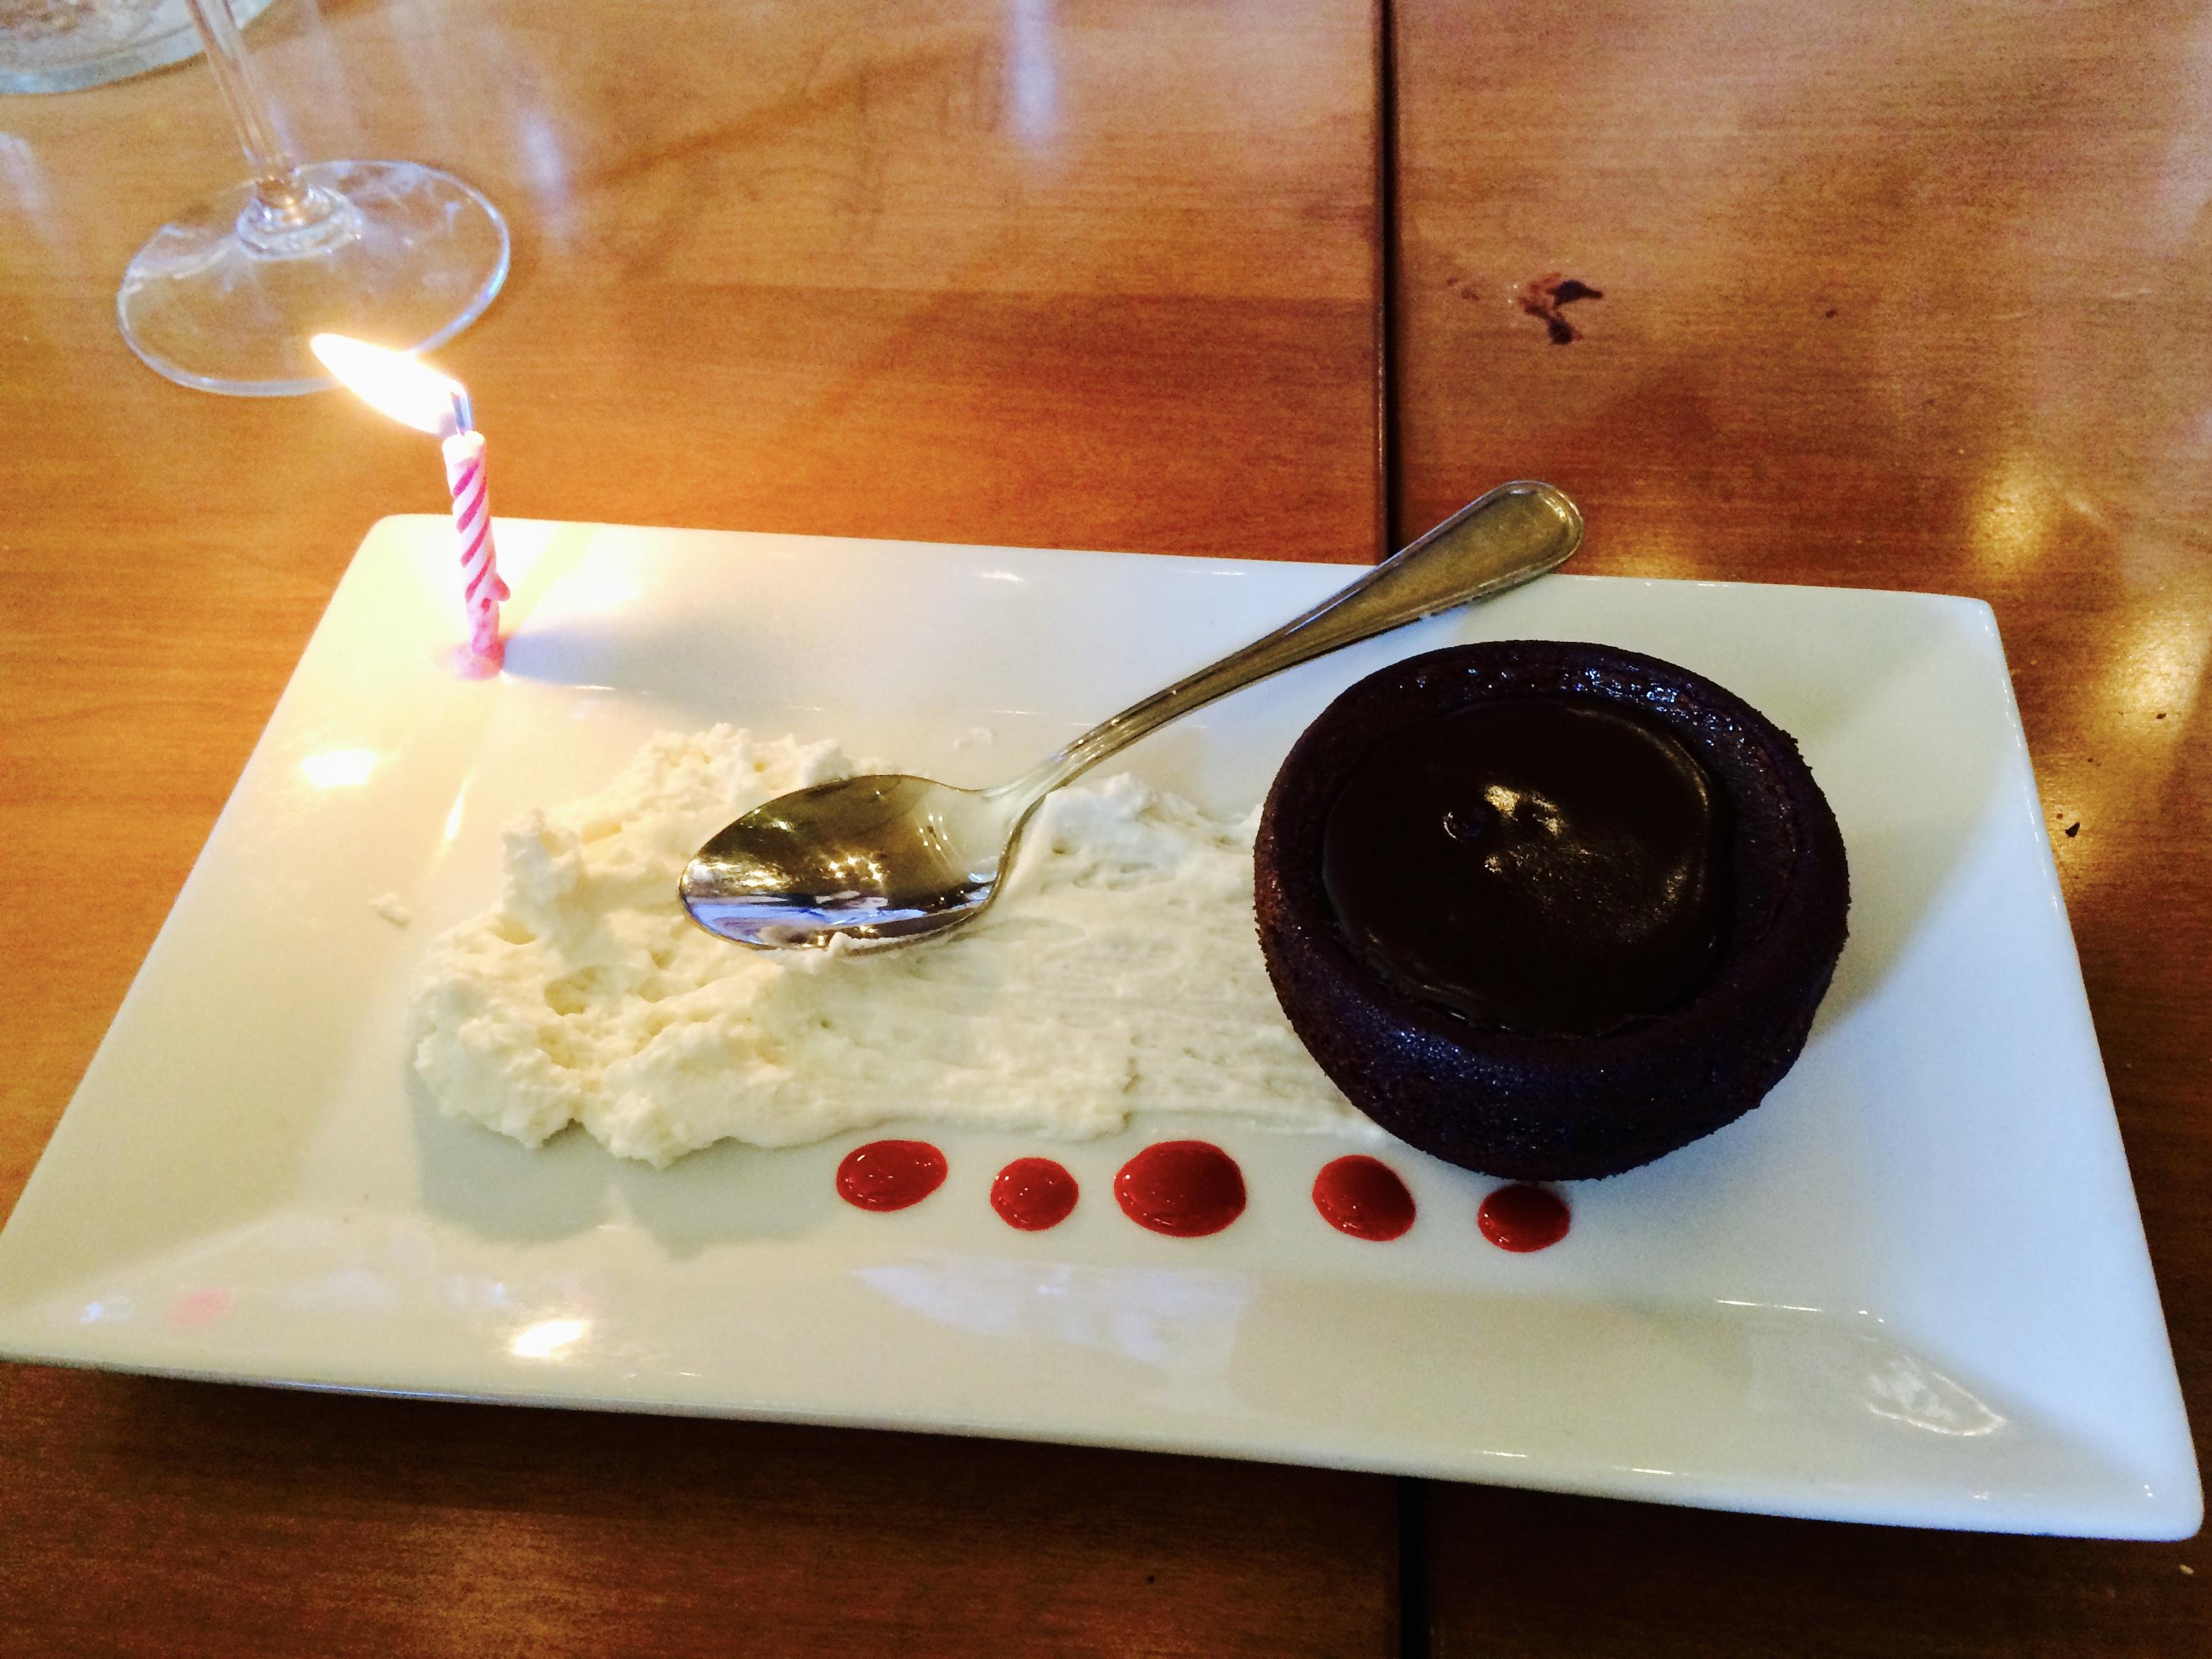 Birthday Brunch: Simple is Good